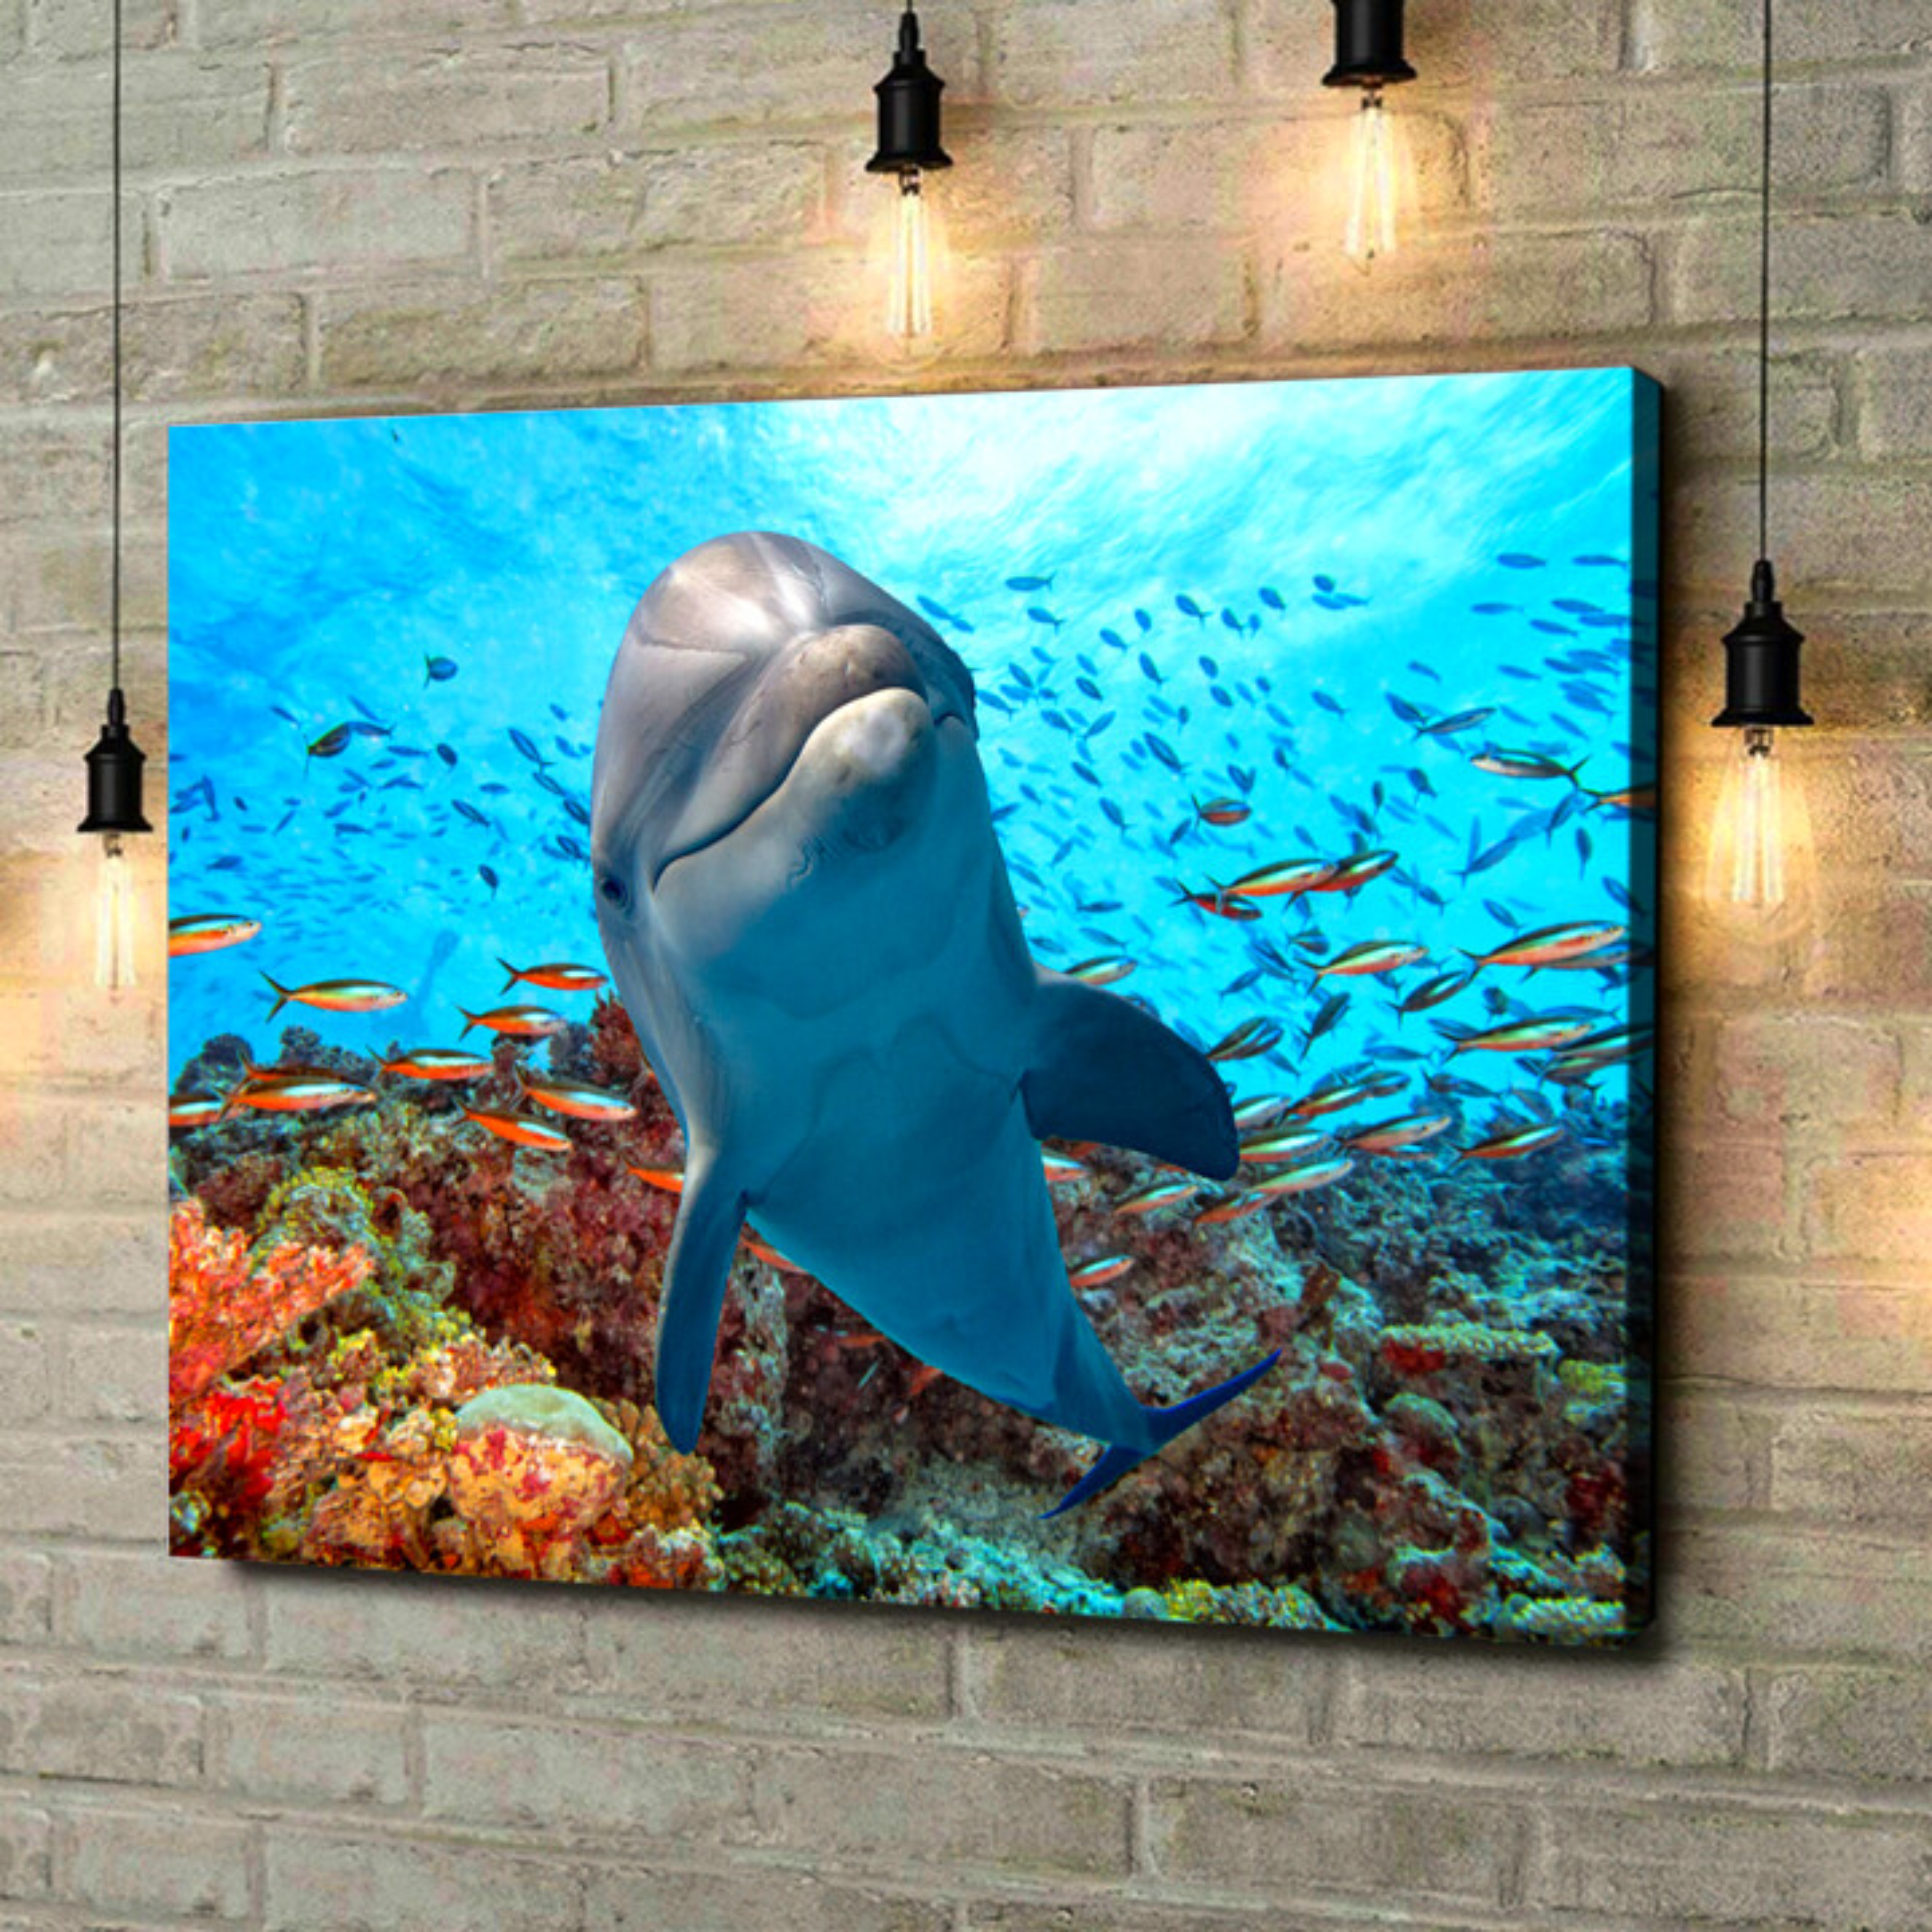 Leinwandbild personalisiert Delfin im Korallenriff